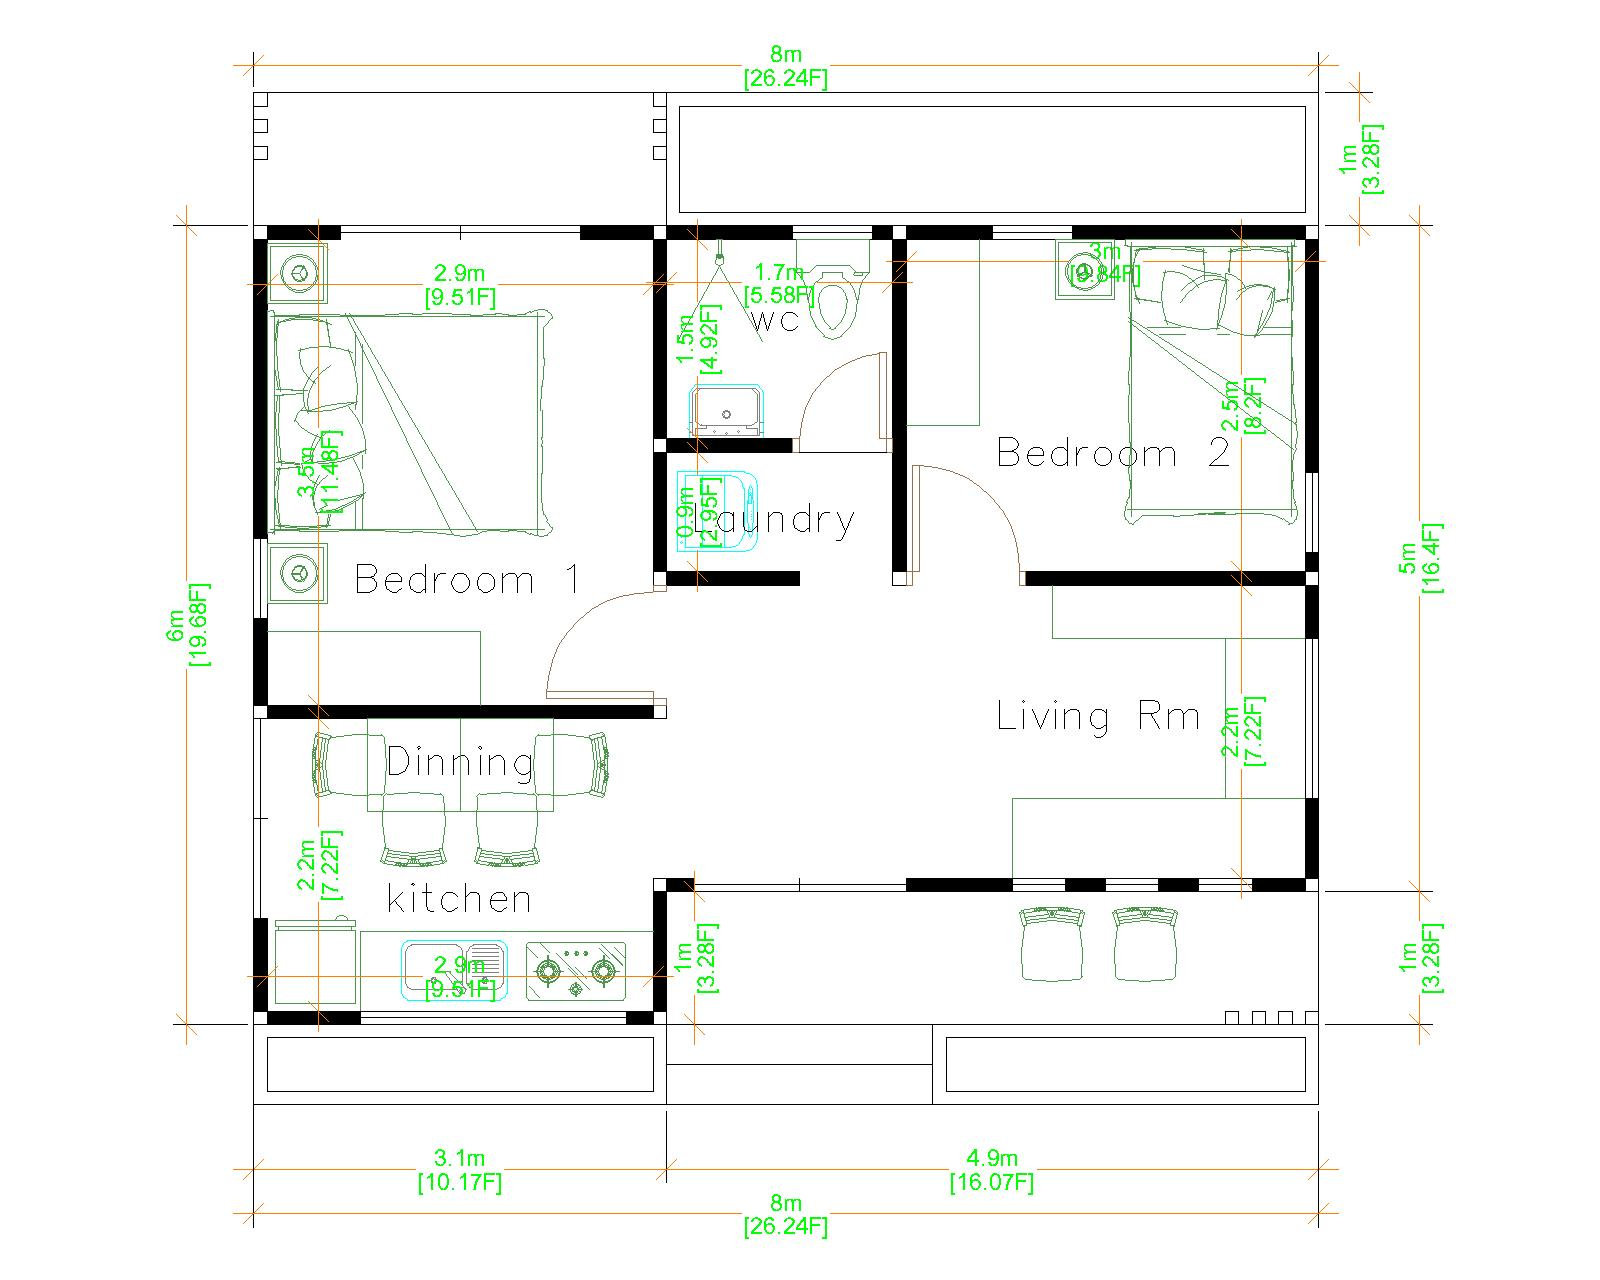 Simple Bungalow House Designs 8x6 Meter 26x20 Feet 2 Beds Floor plans